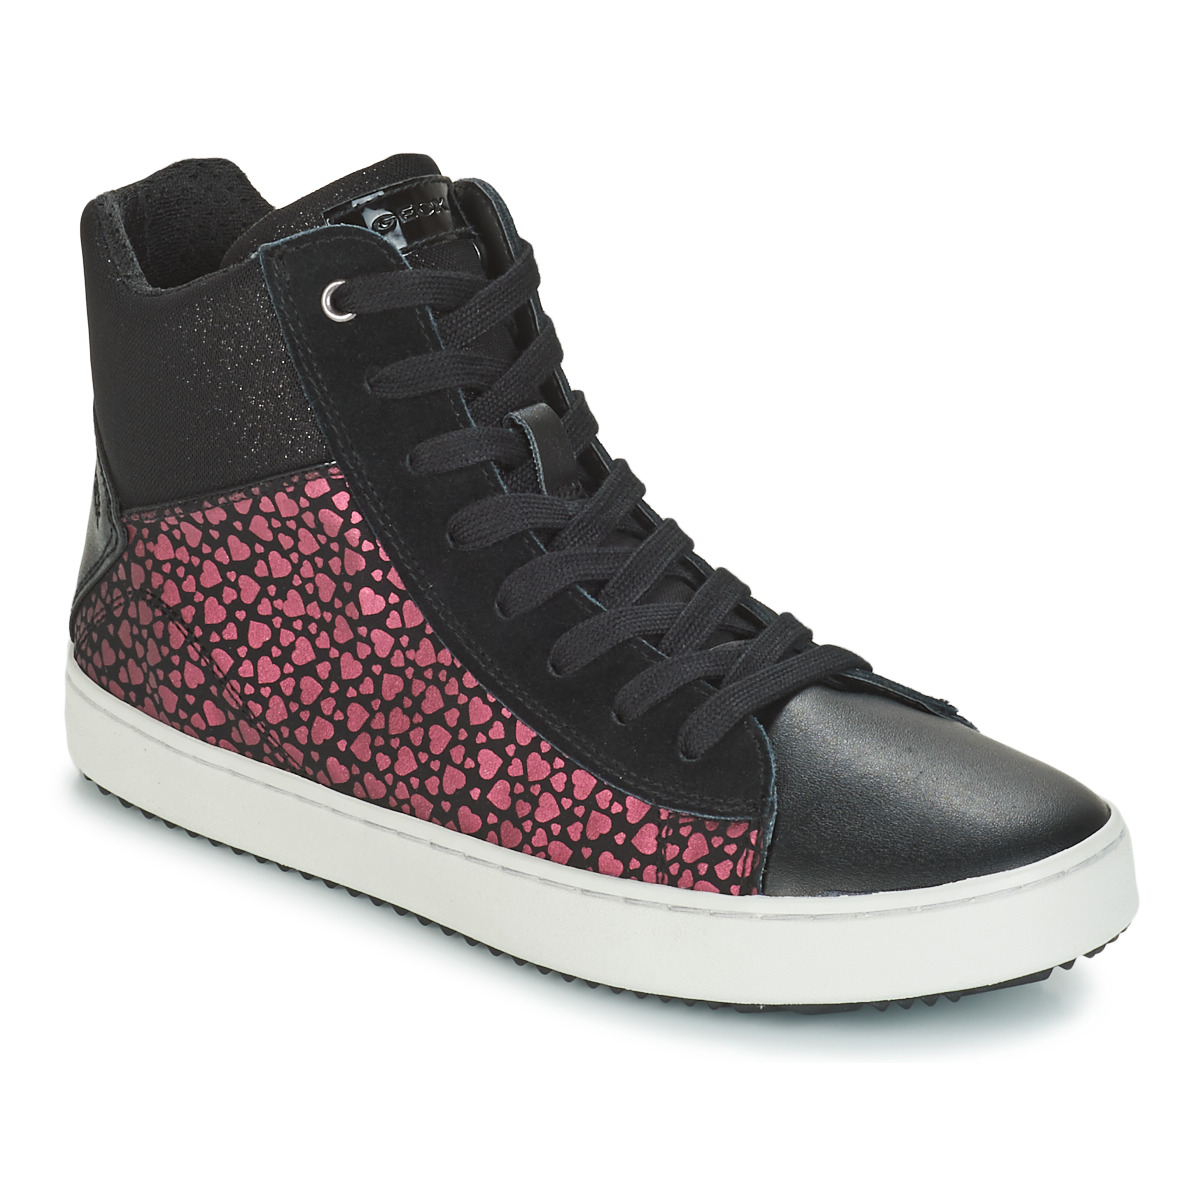 f8caa414431 Ψηλά Sneakers Geox J KALISPERA GIRL, Παιδικά sneakers, ΠΑΙΔΙ ...